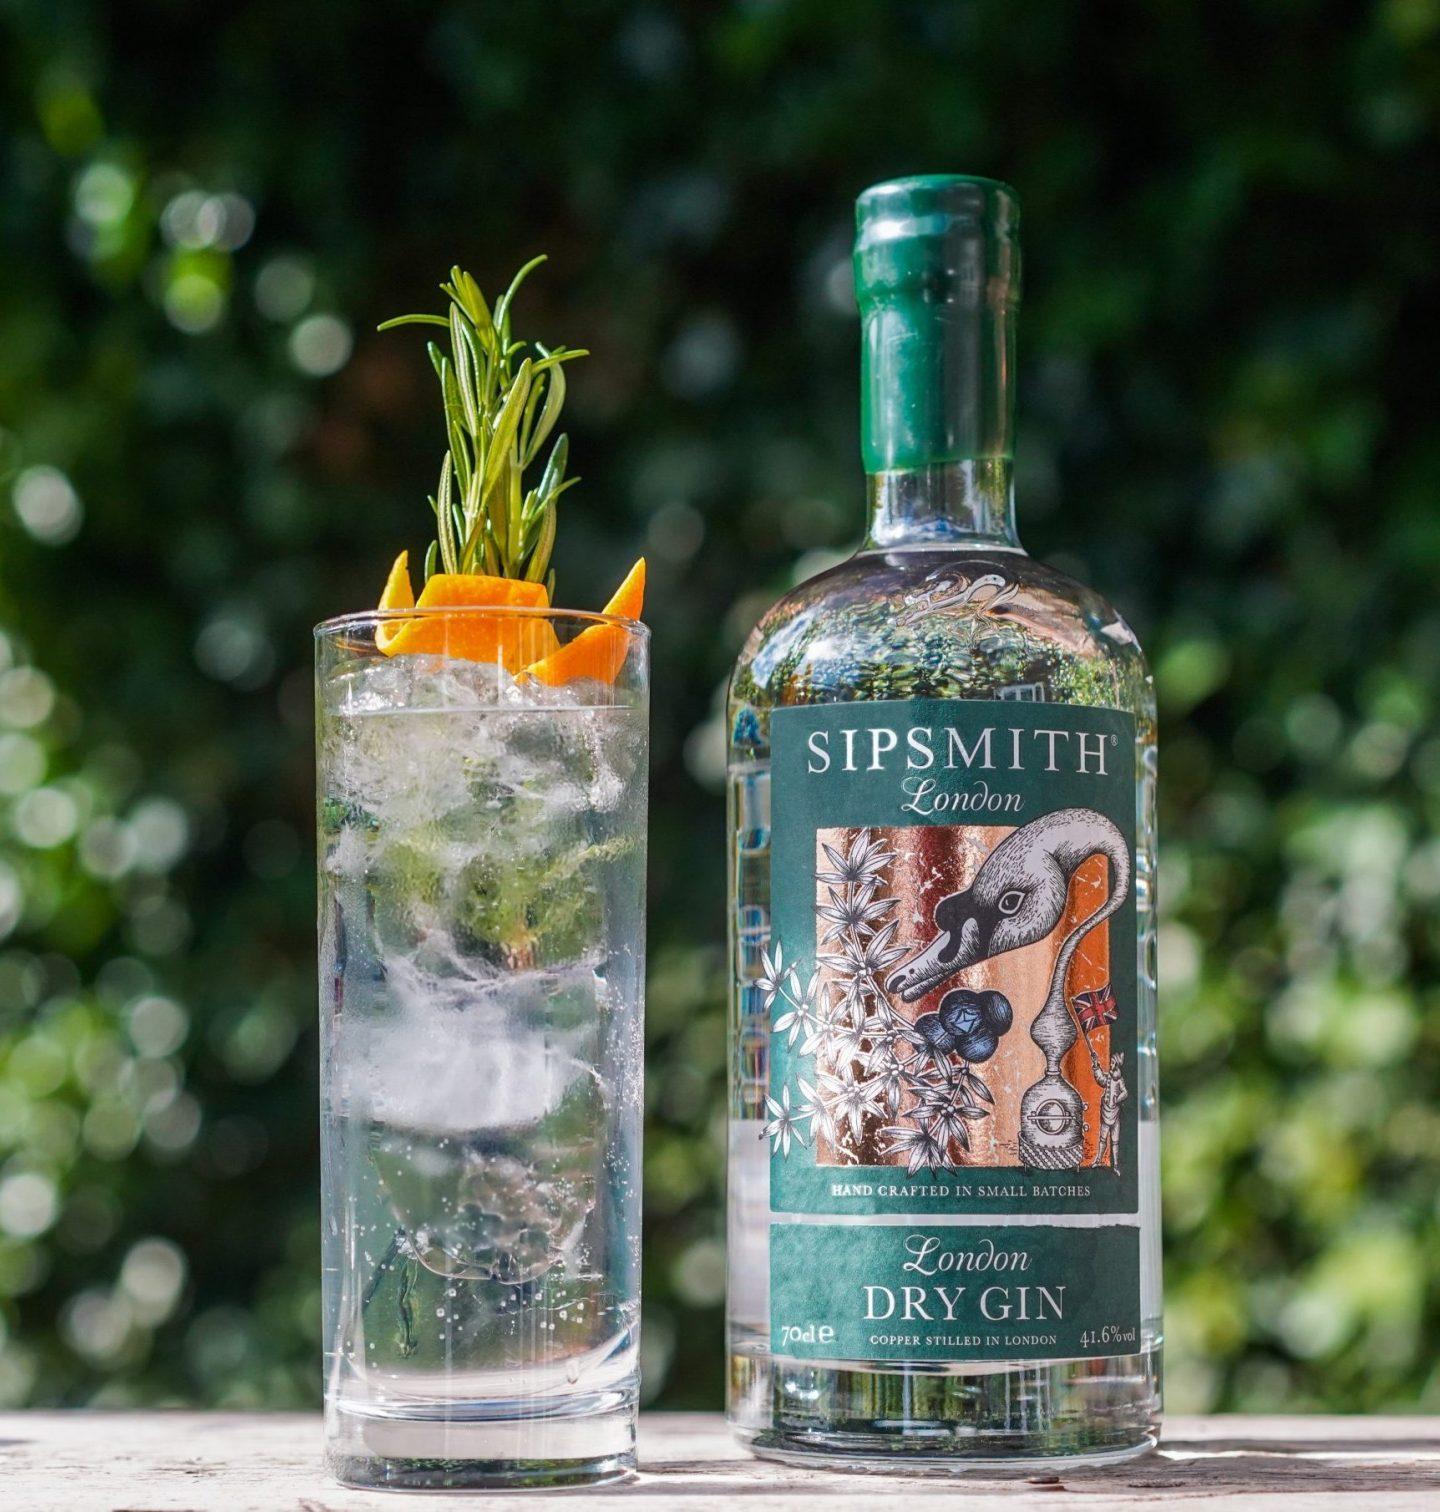 Sipsmith Botanical Gin and Tonic